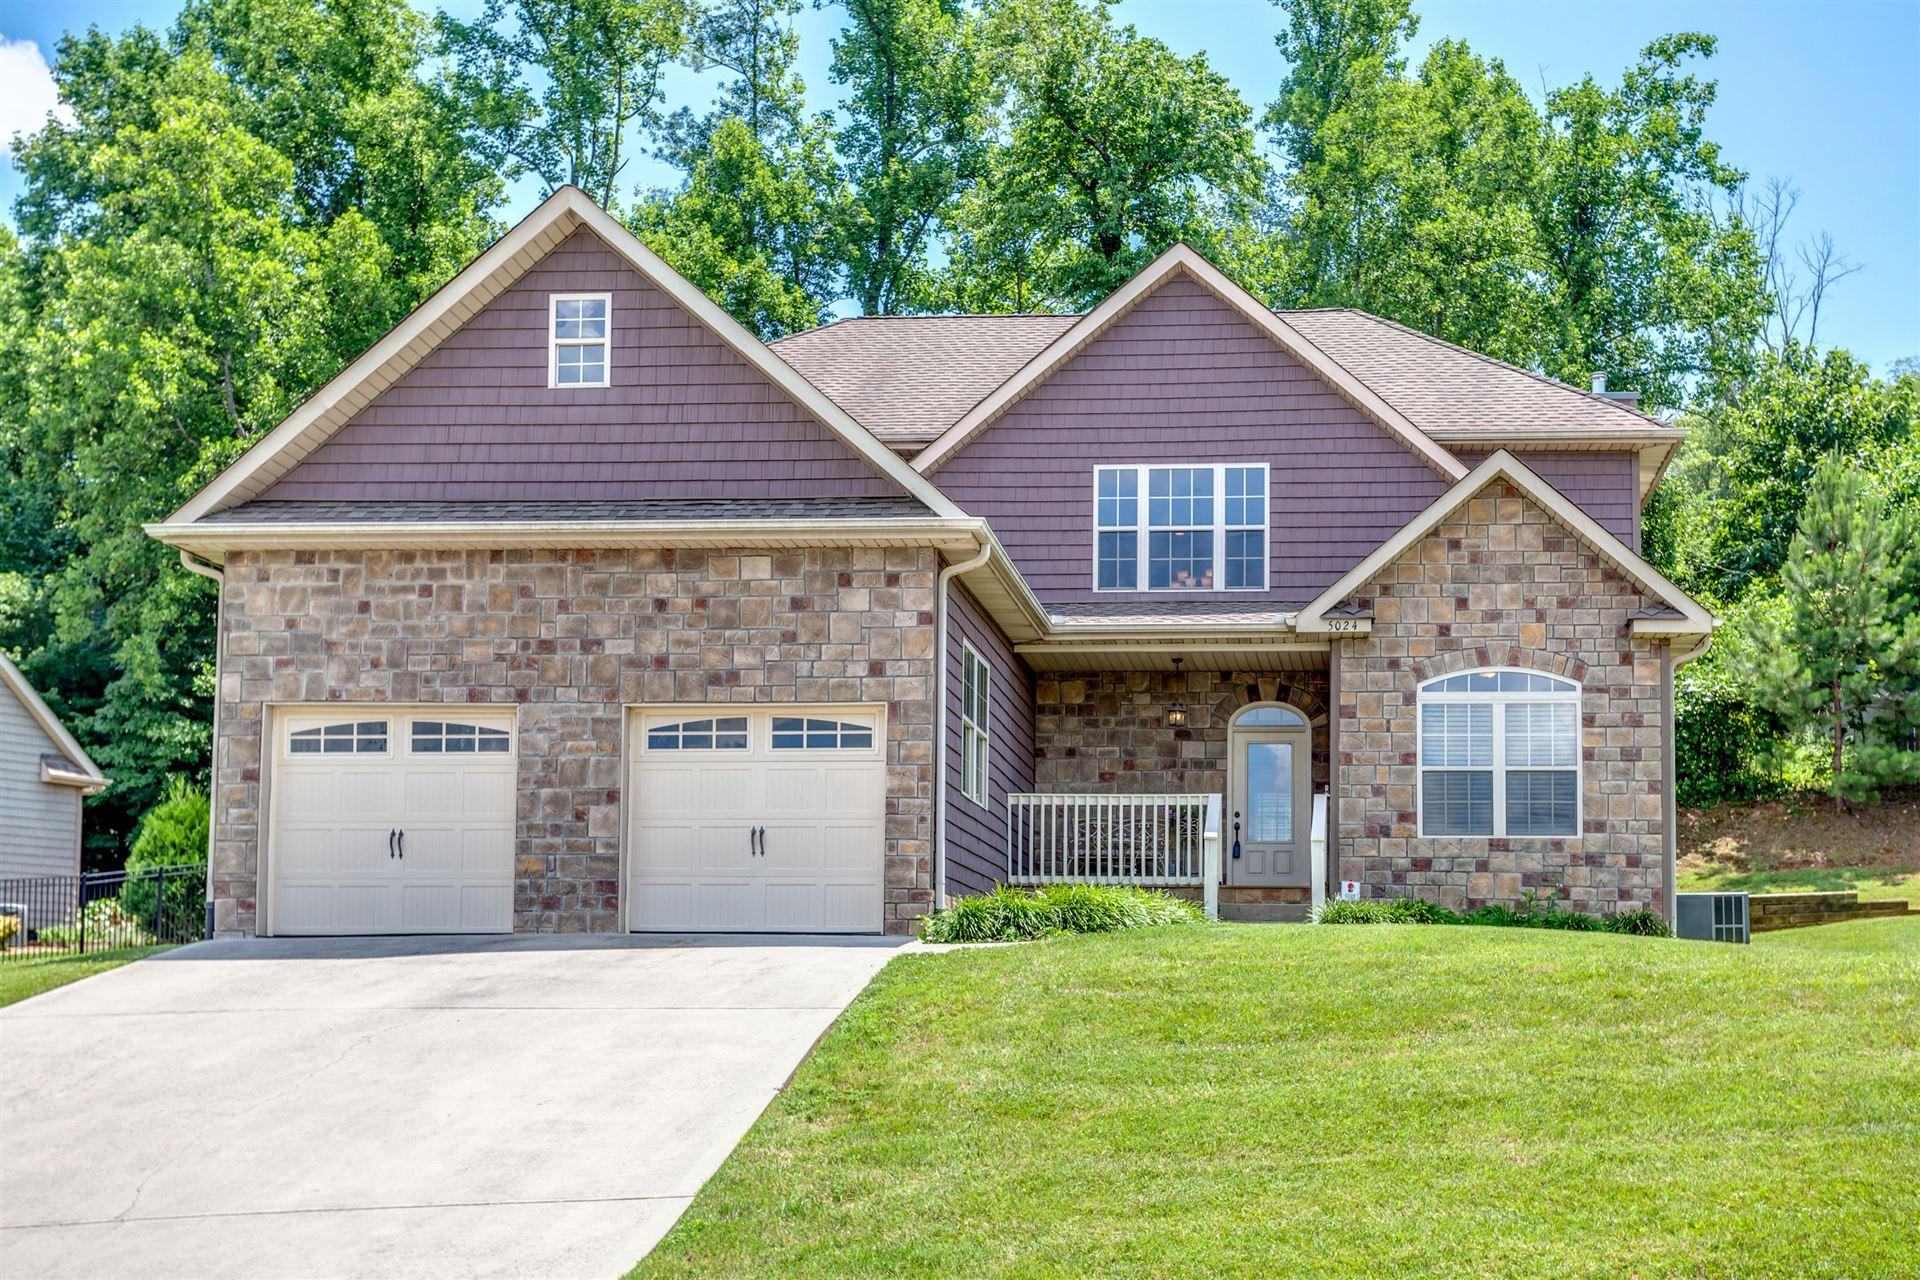 Photo of 5024 Morningstar Lane, Knoxville, TN 37909 (MLS # 1122154)